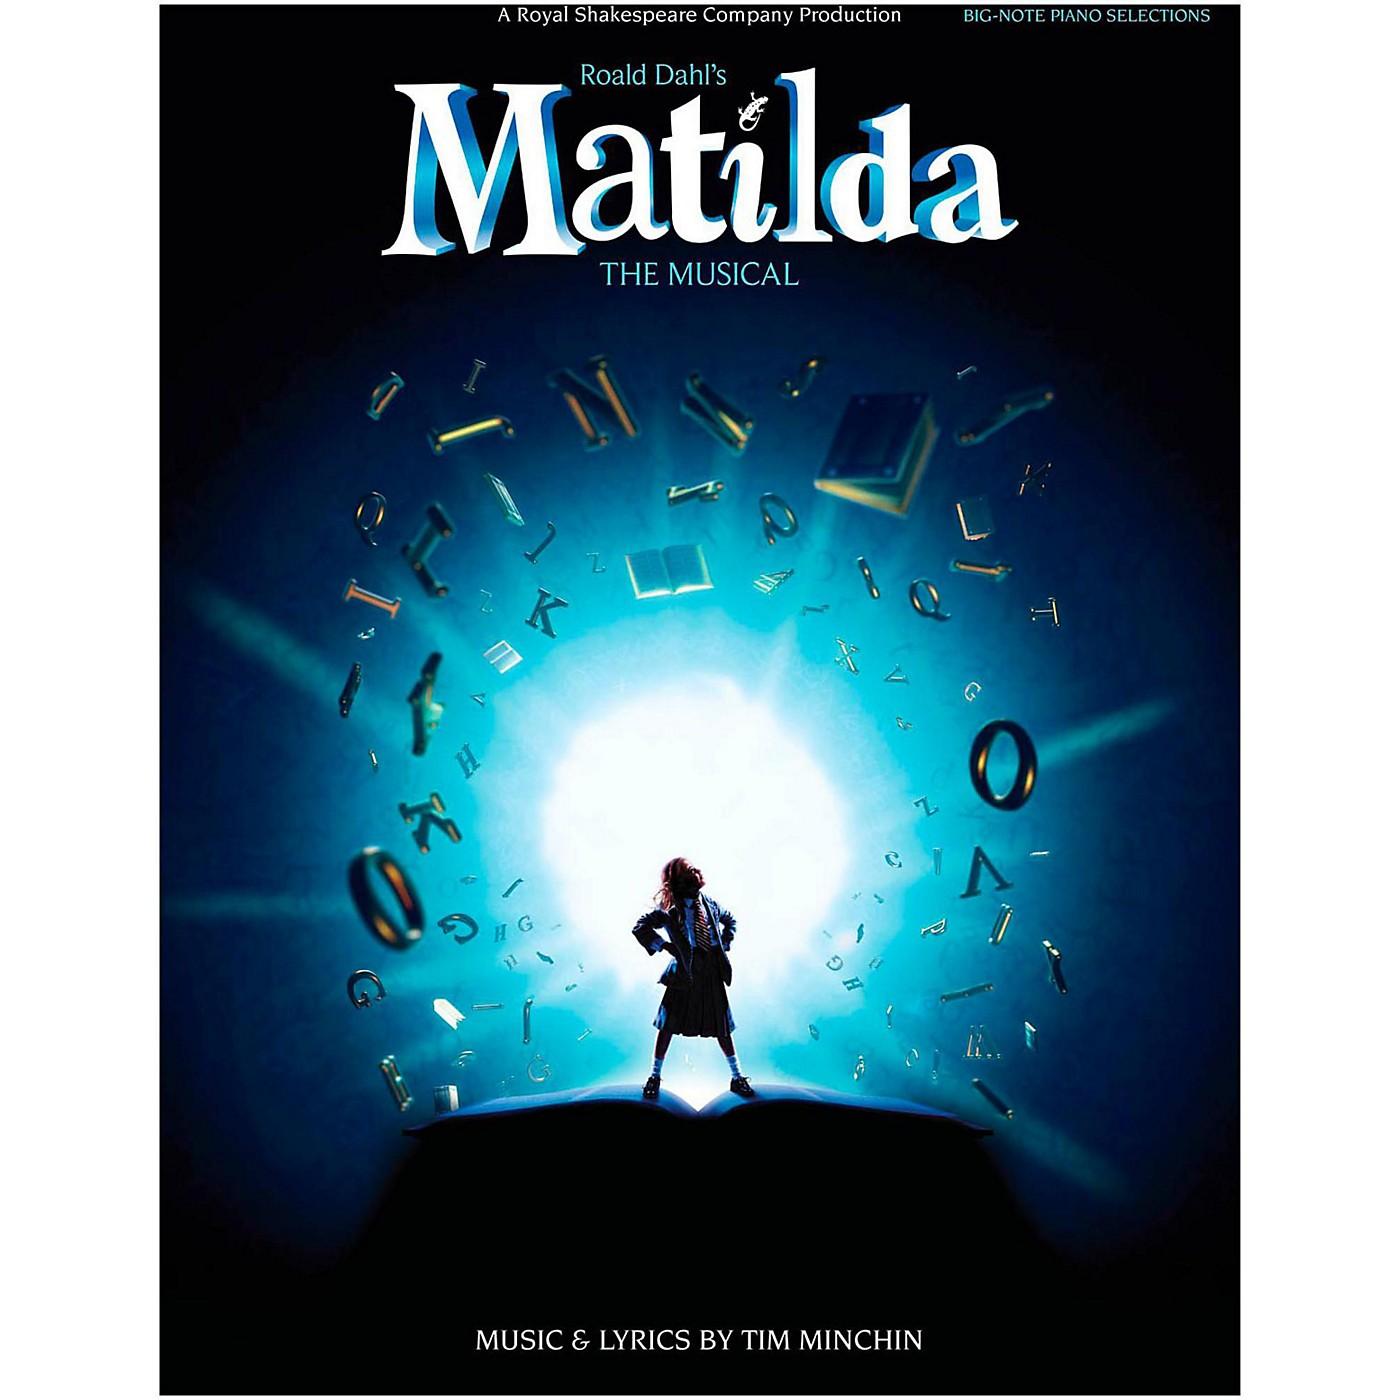 Hal Leonard Matilda - The Musical for Big Note Piano thumbnail